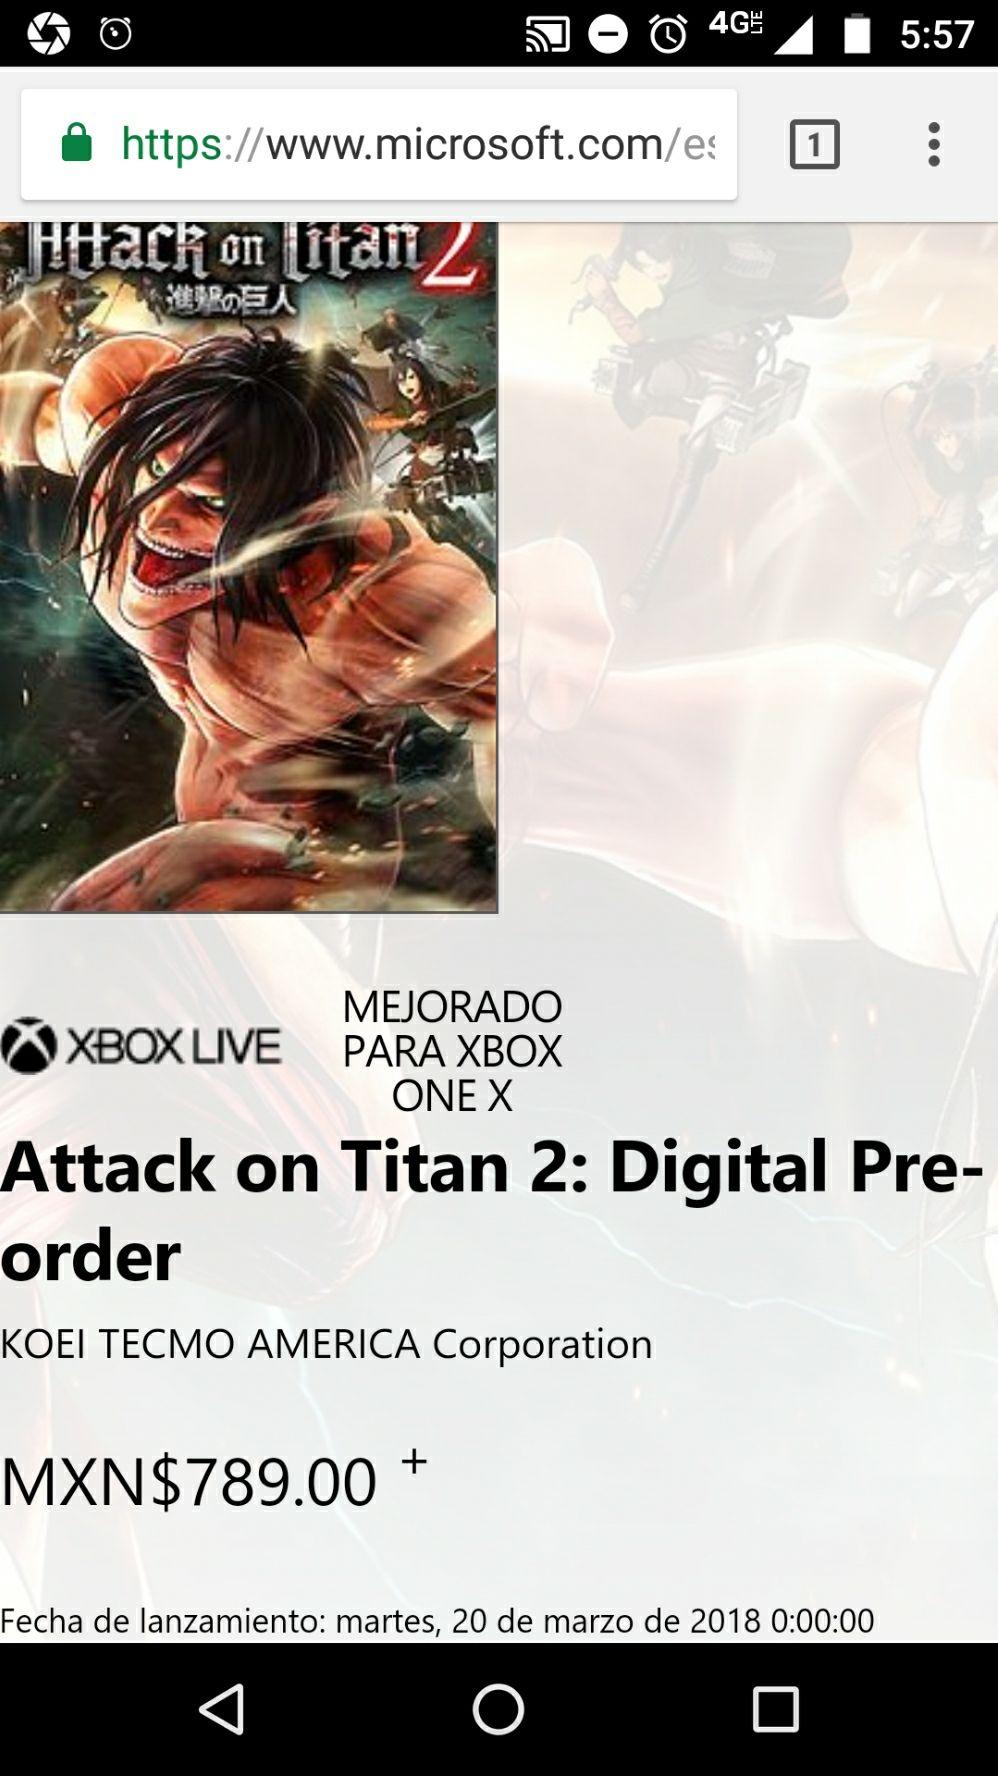 Microsoft Store: Attack on Titan 2 Digital Preorder - Xbox One